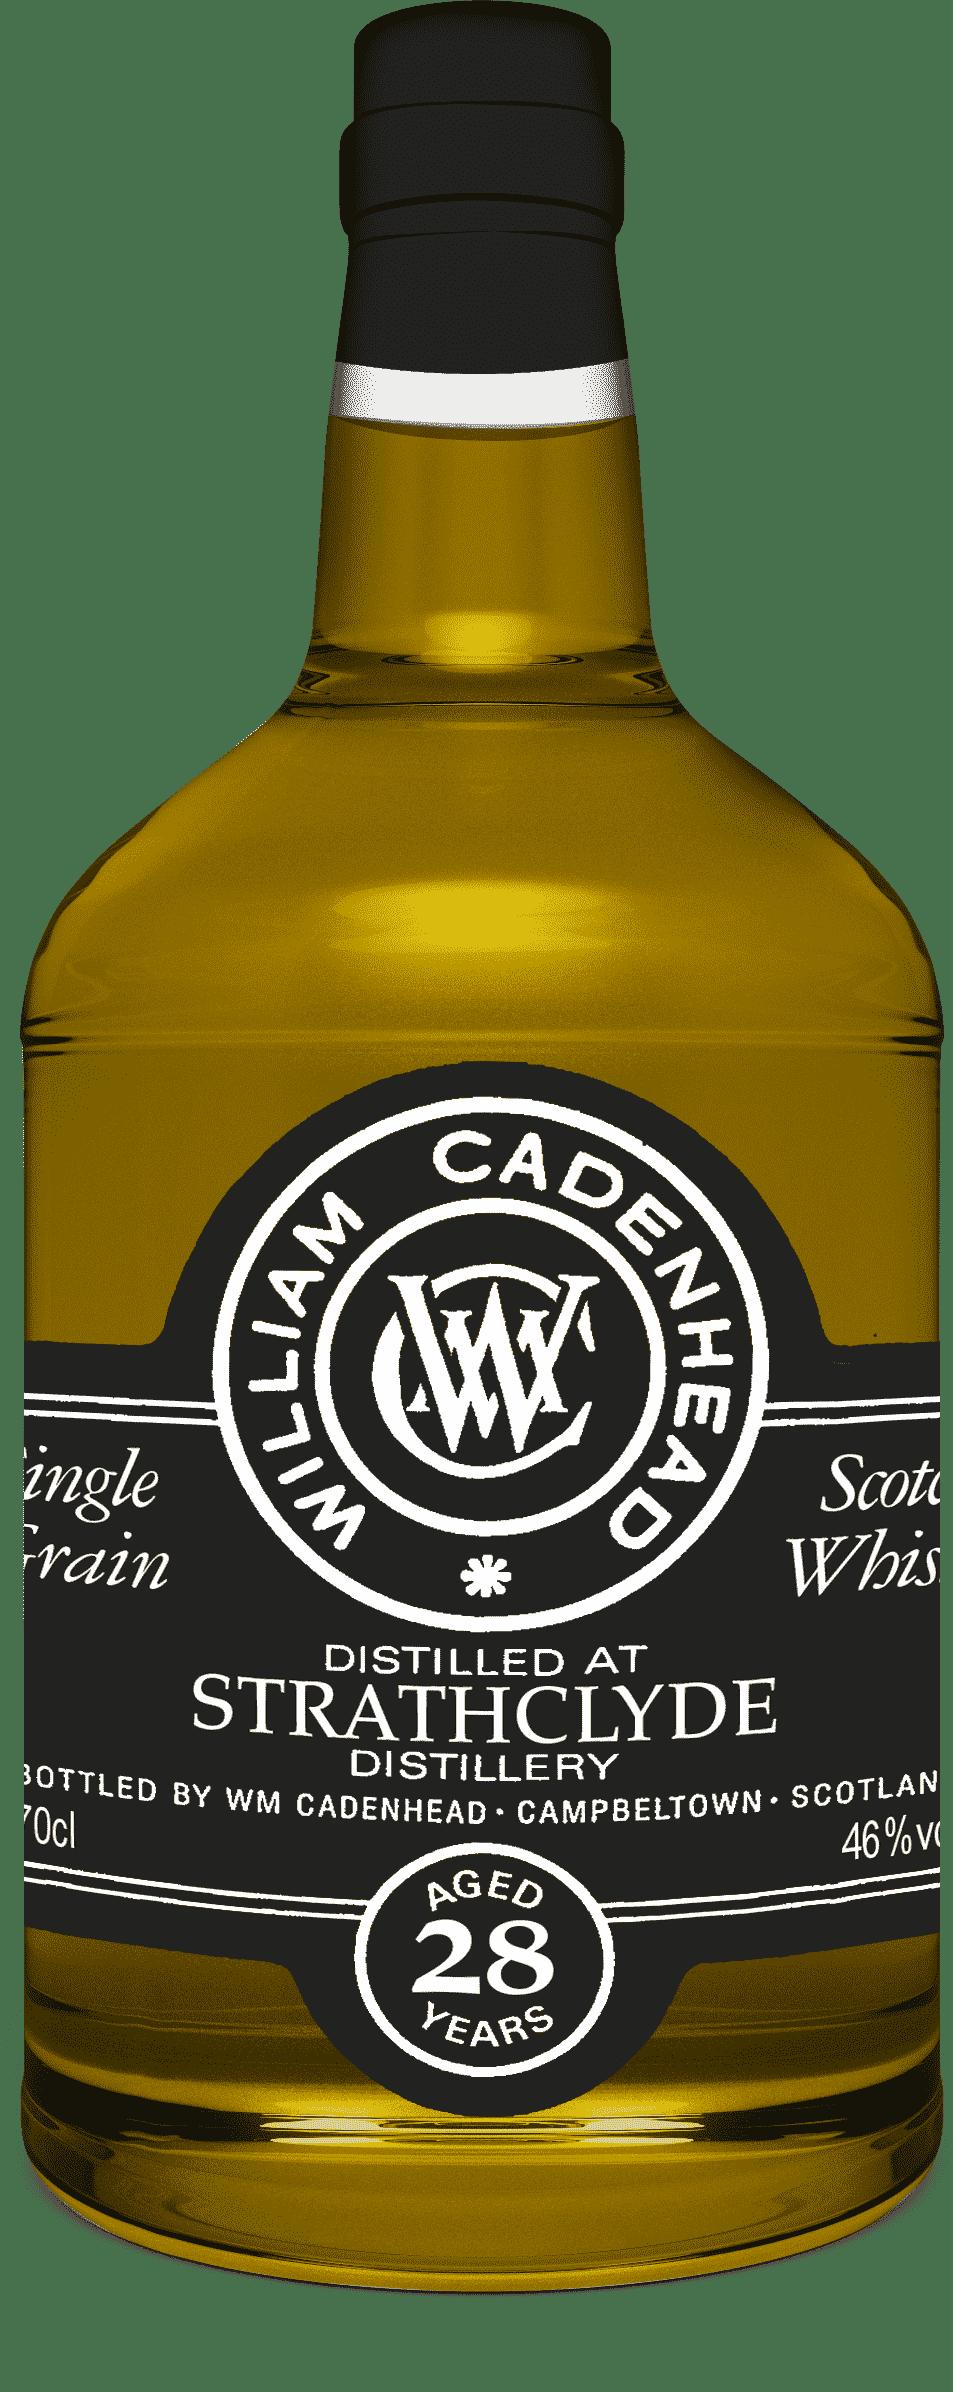 A Bottle of Strathclyde-28-YO